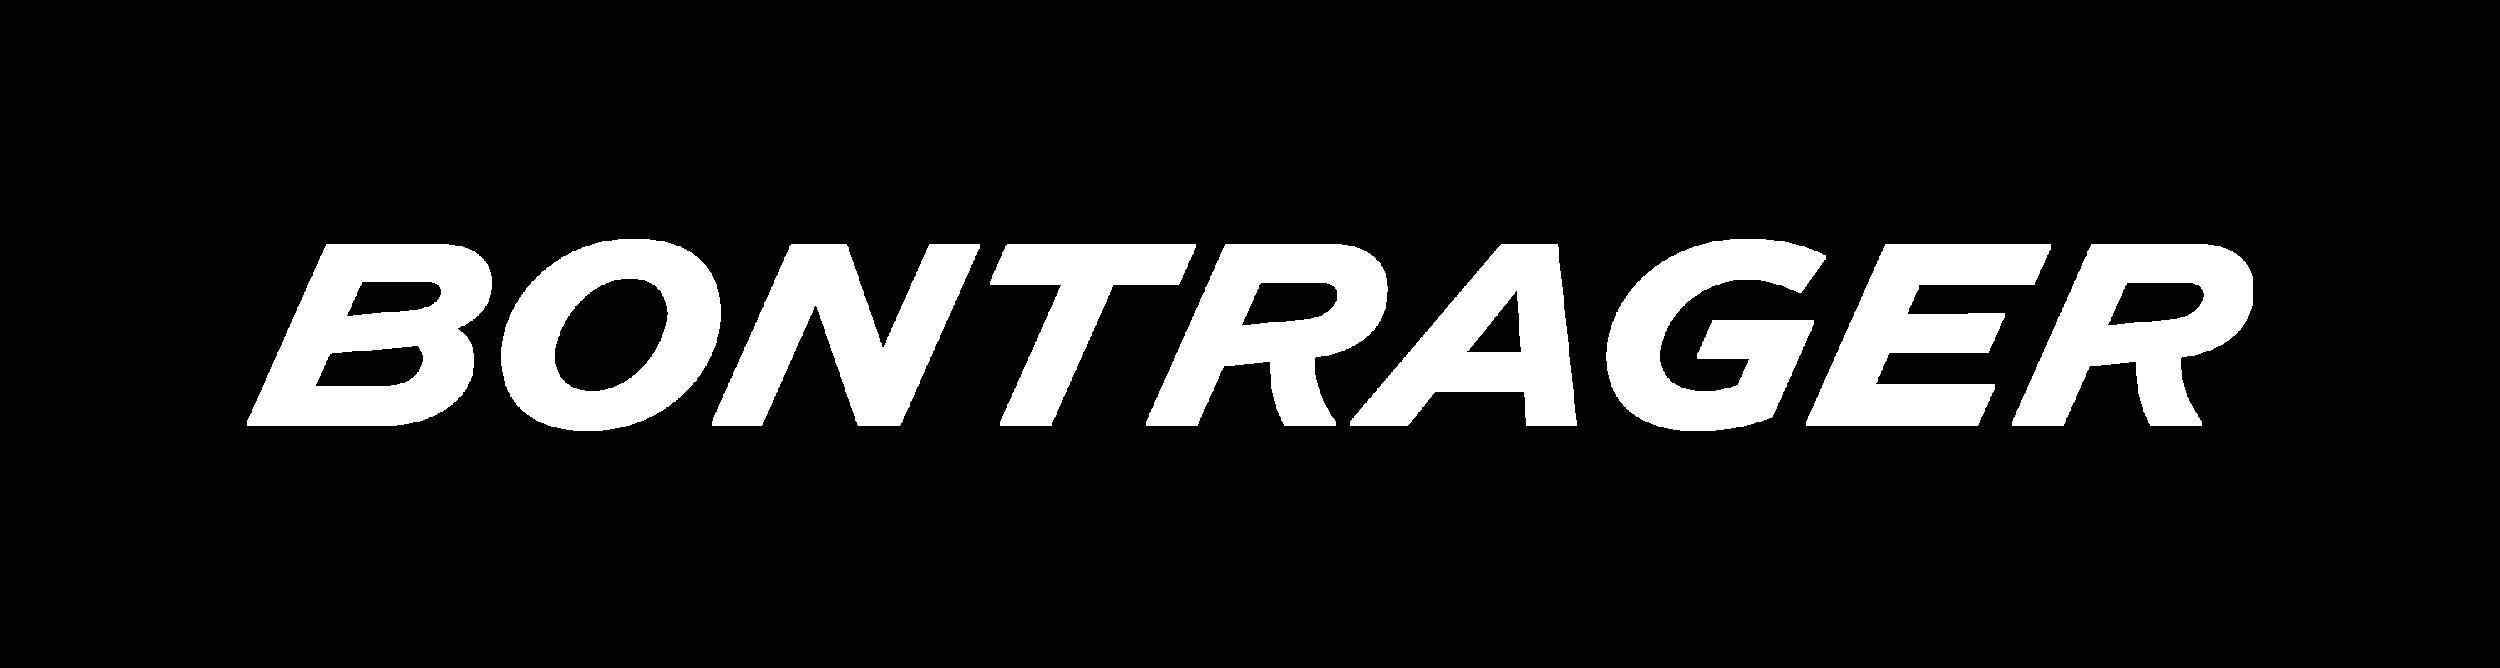 2018_Bontrager_logo_white.png